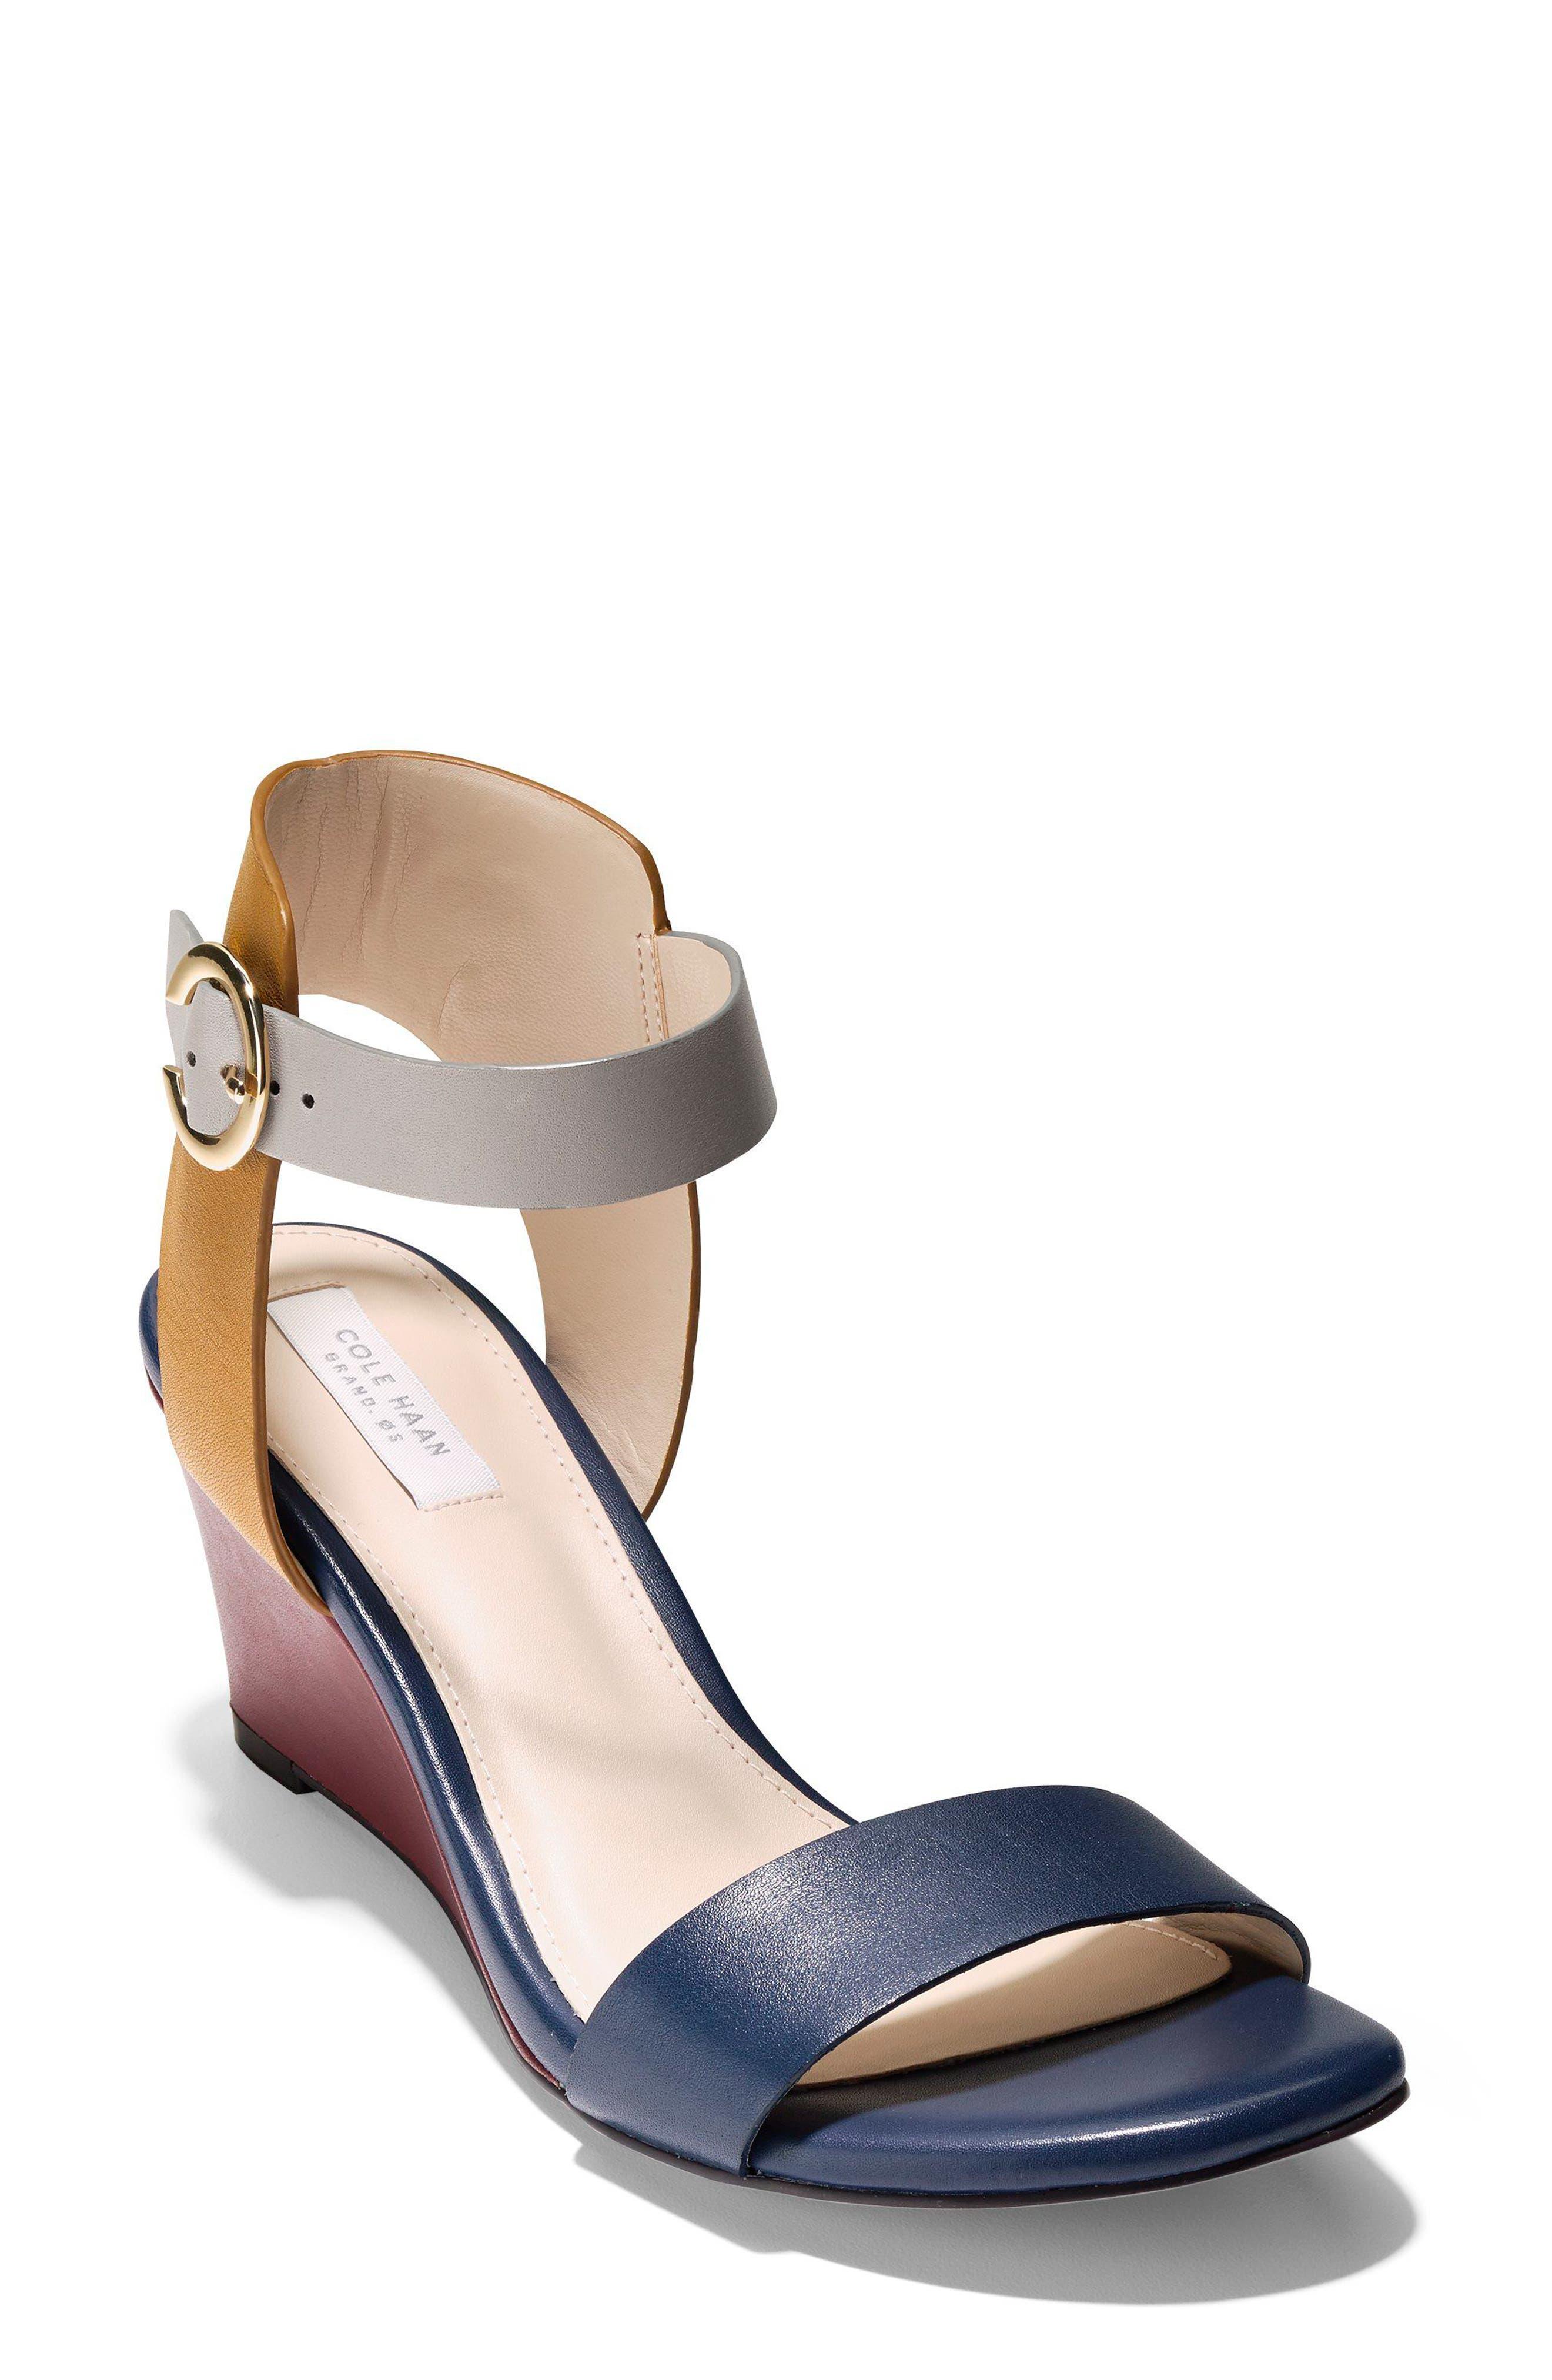 Rosalind Wedge Sandal,                             Main thumbnail 3, color,